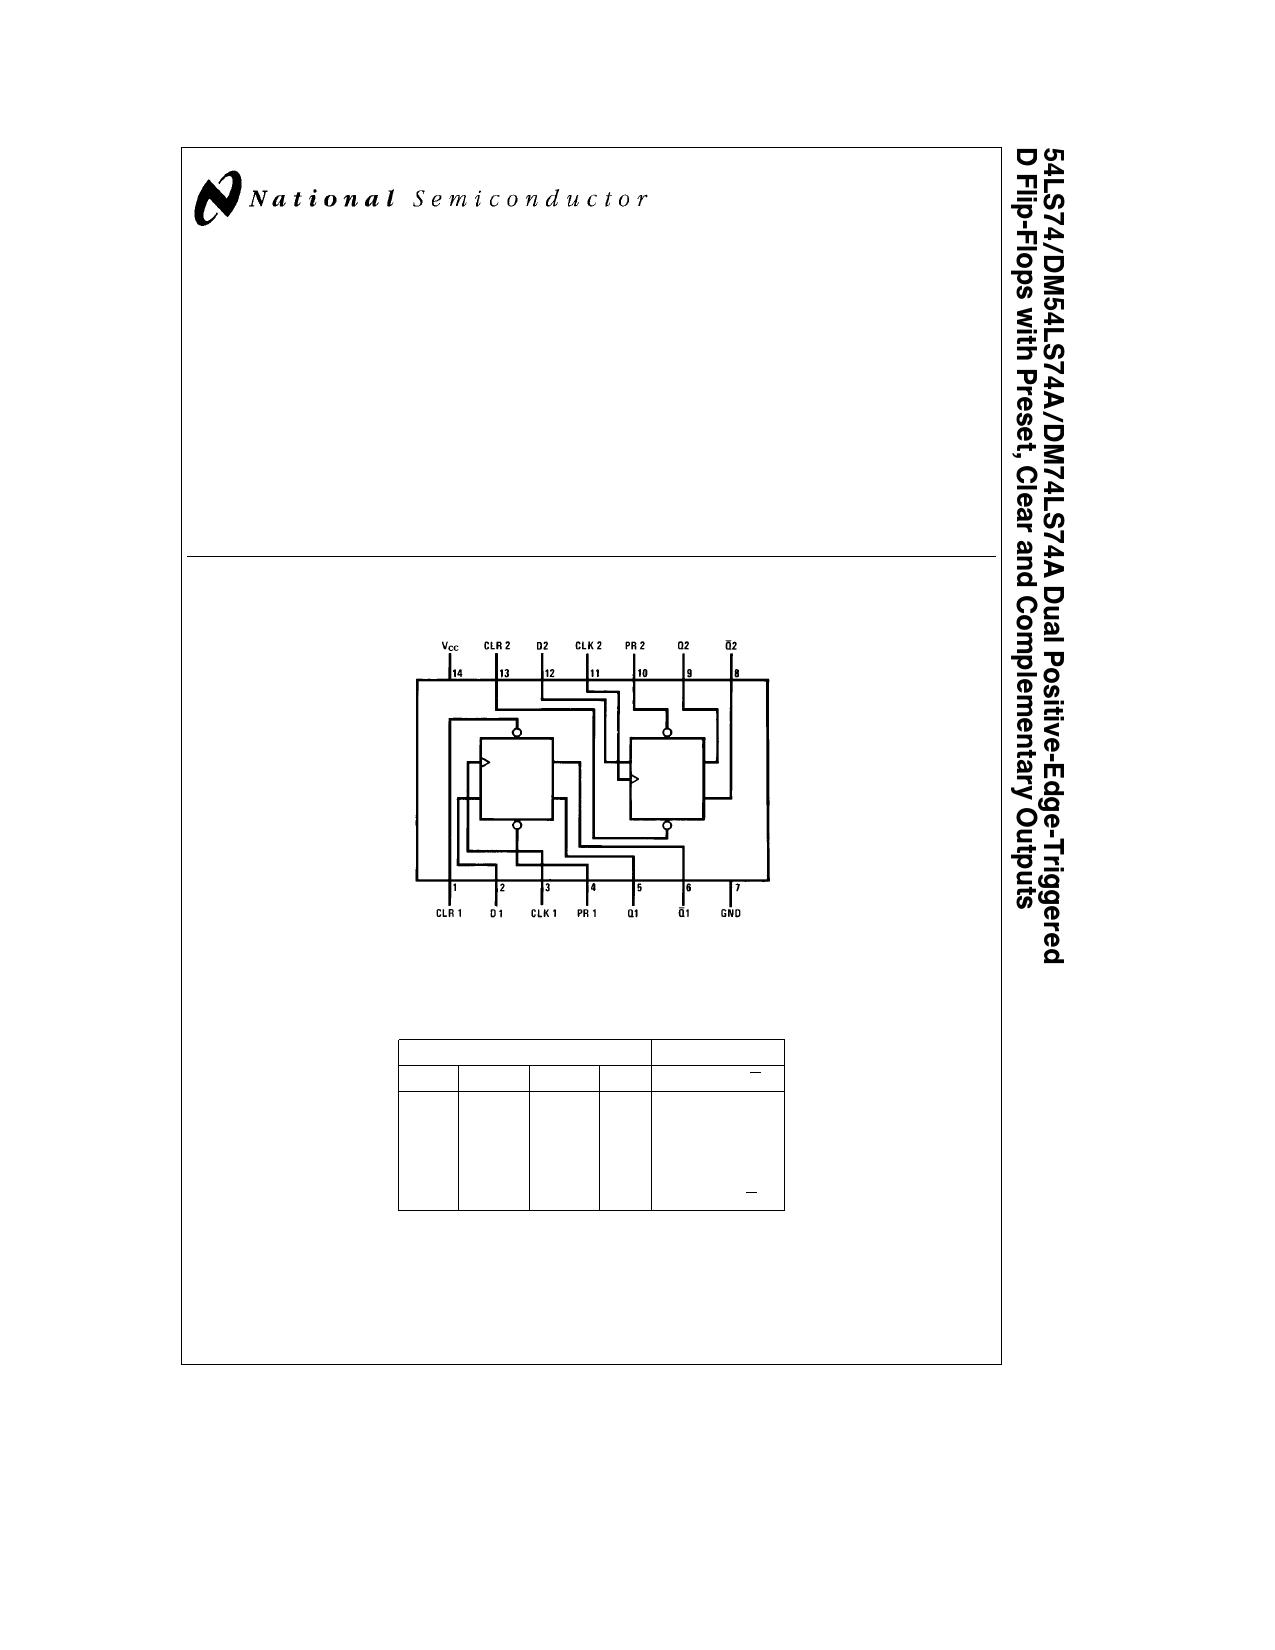 74ls74 datasheet pdf pinout dual positive edge. Black Bedroom Furniture Sets. Home Design Ideas